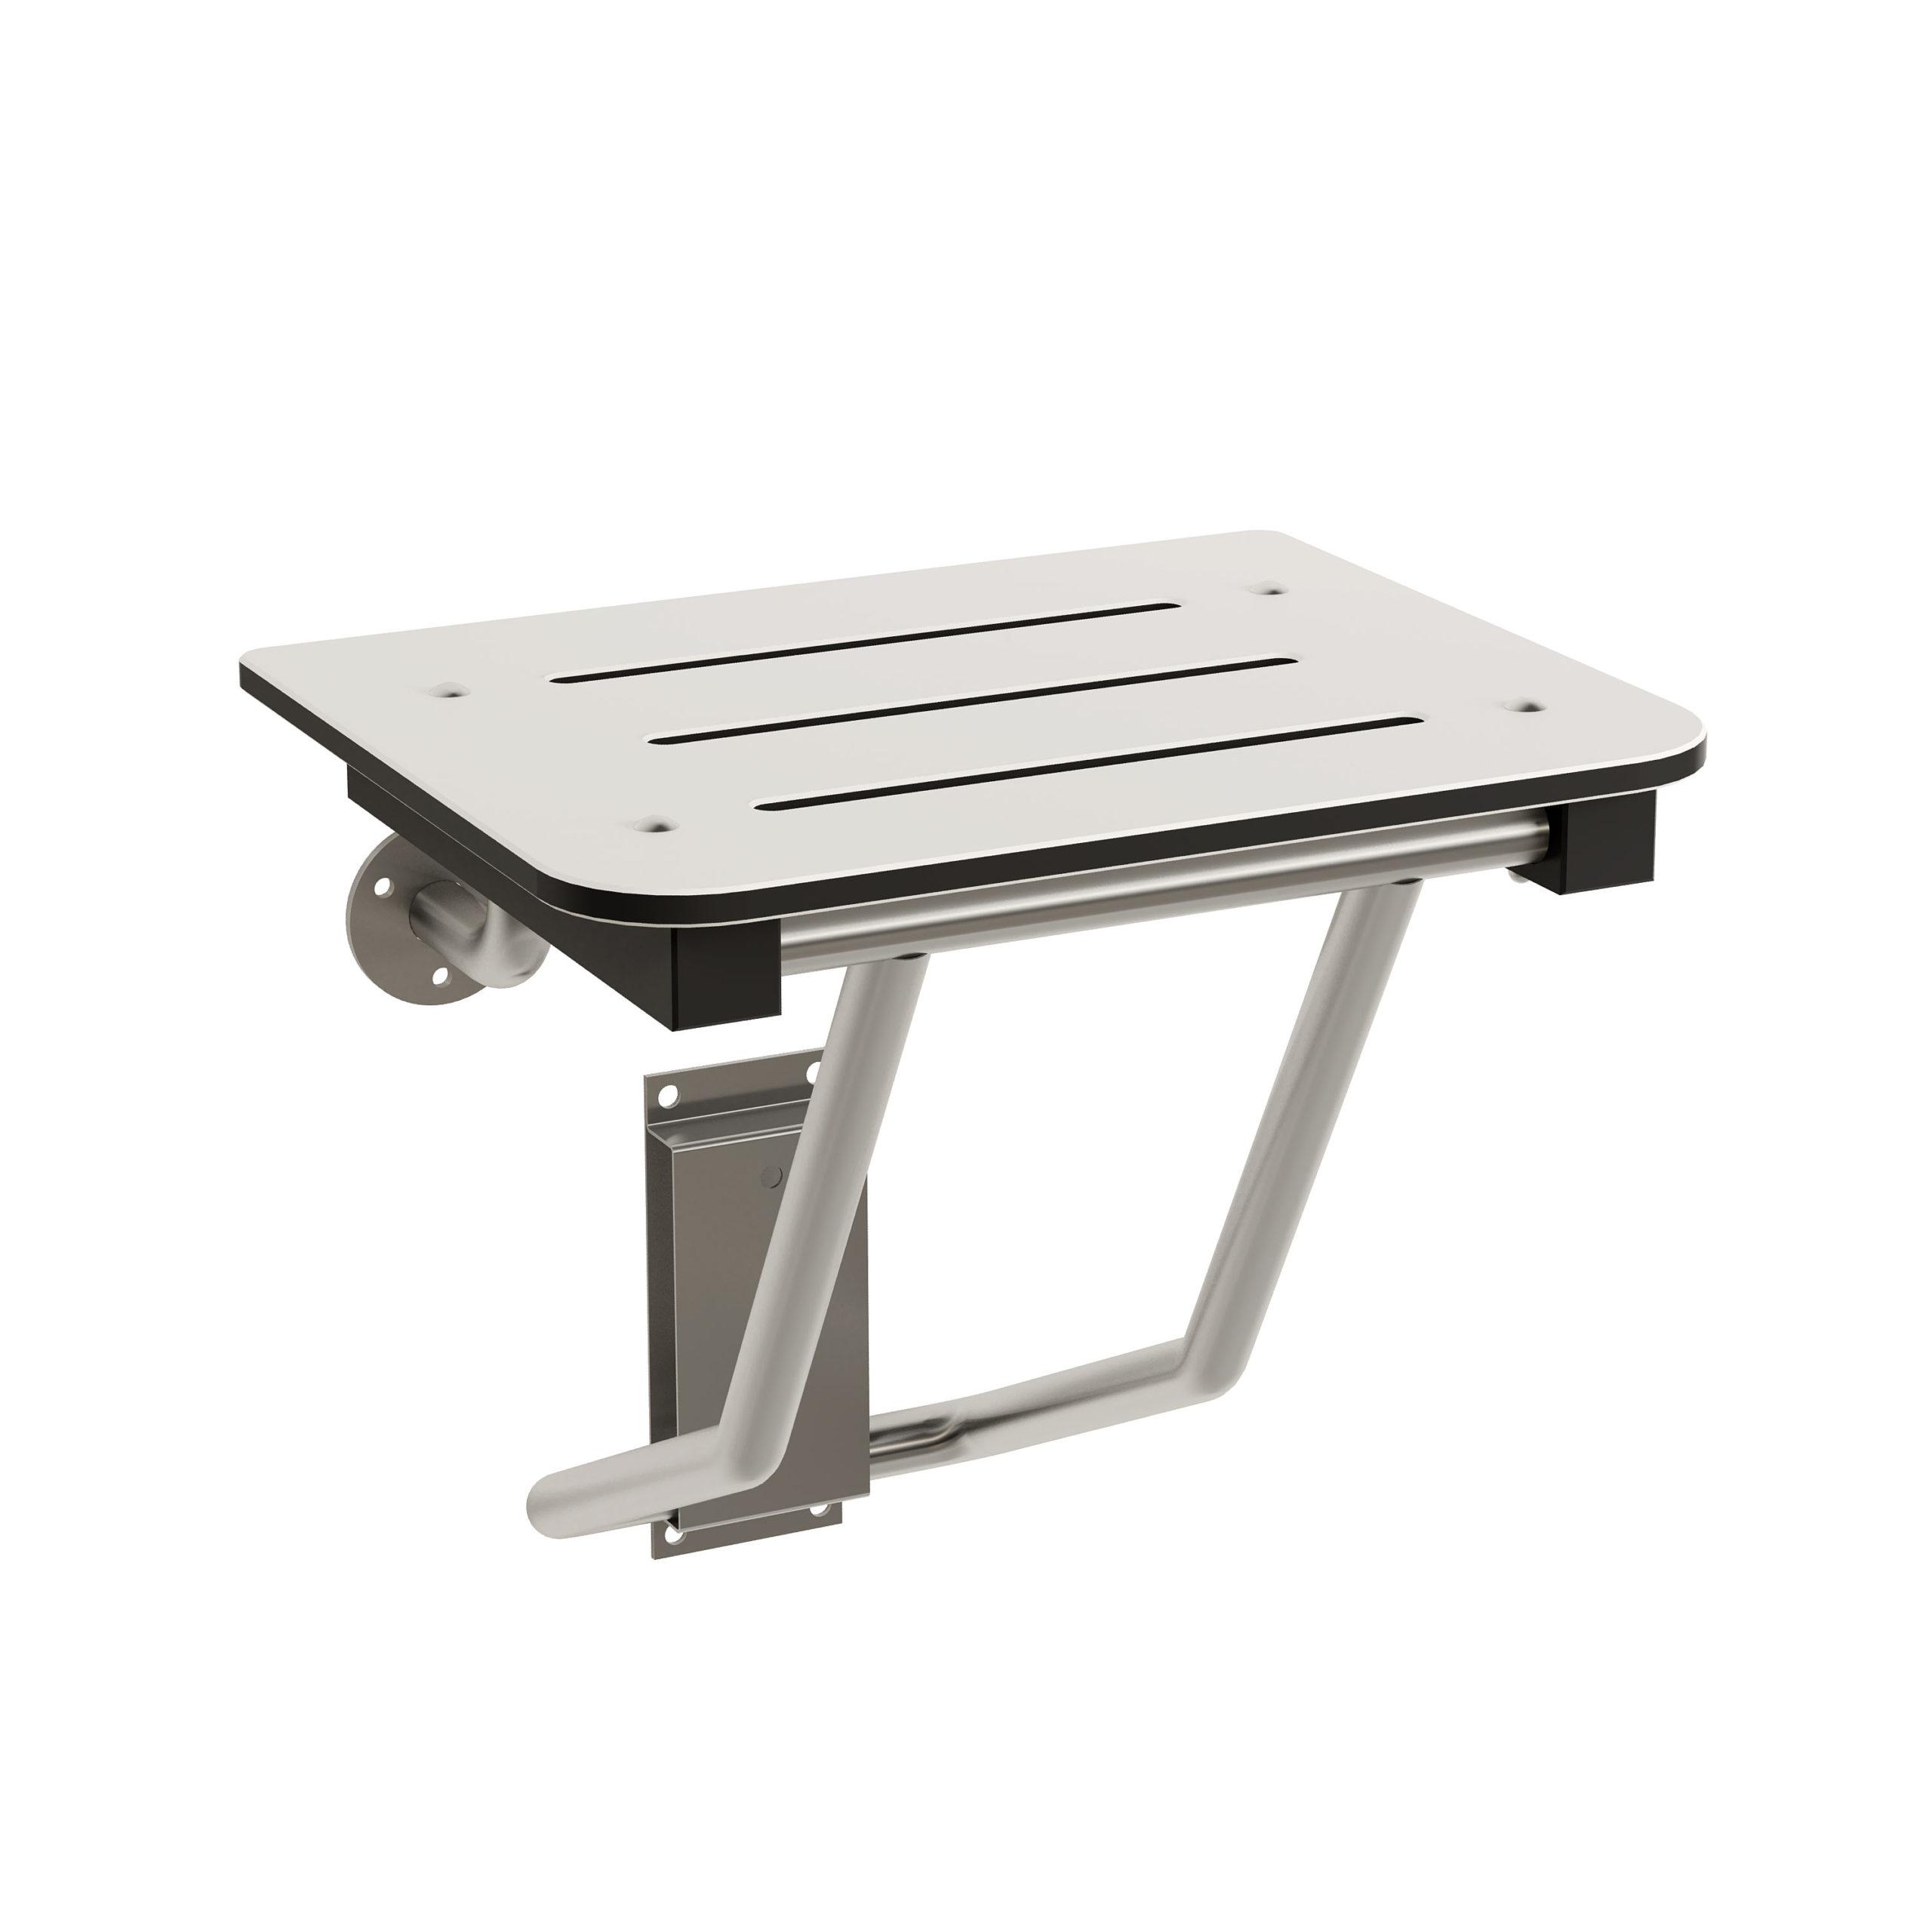 Bradley 9591 Folding Square Phenolic Shower Seat